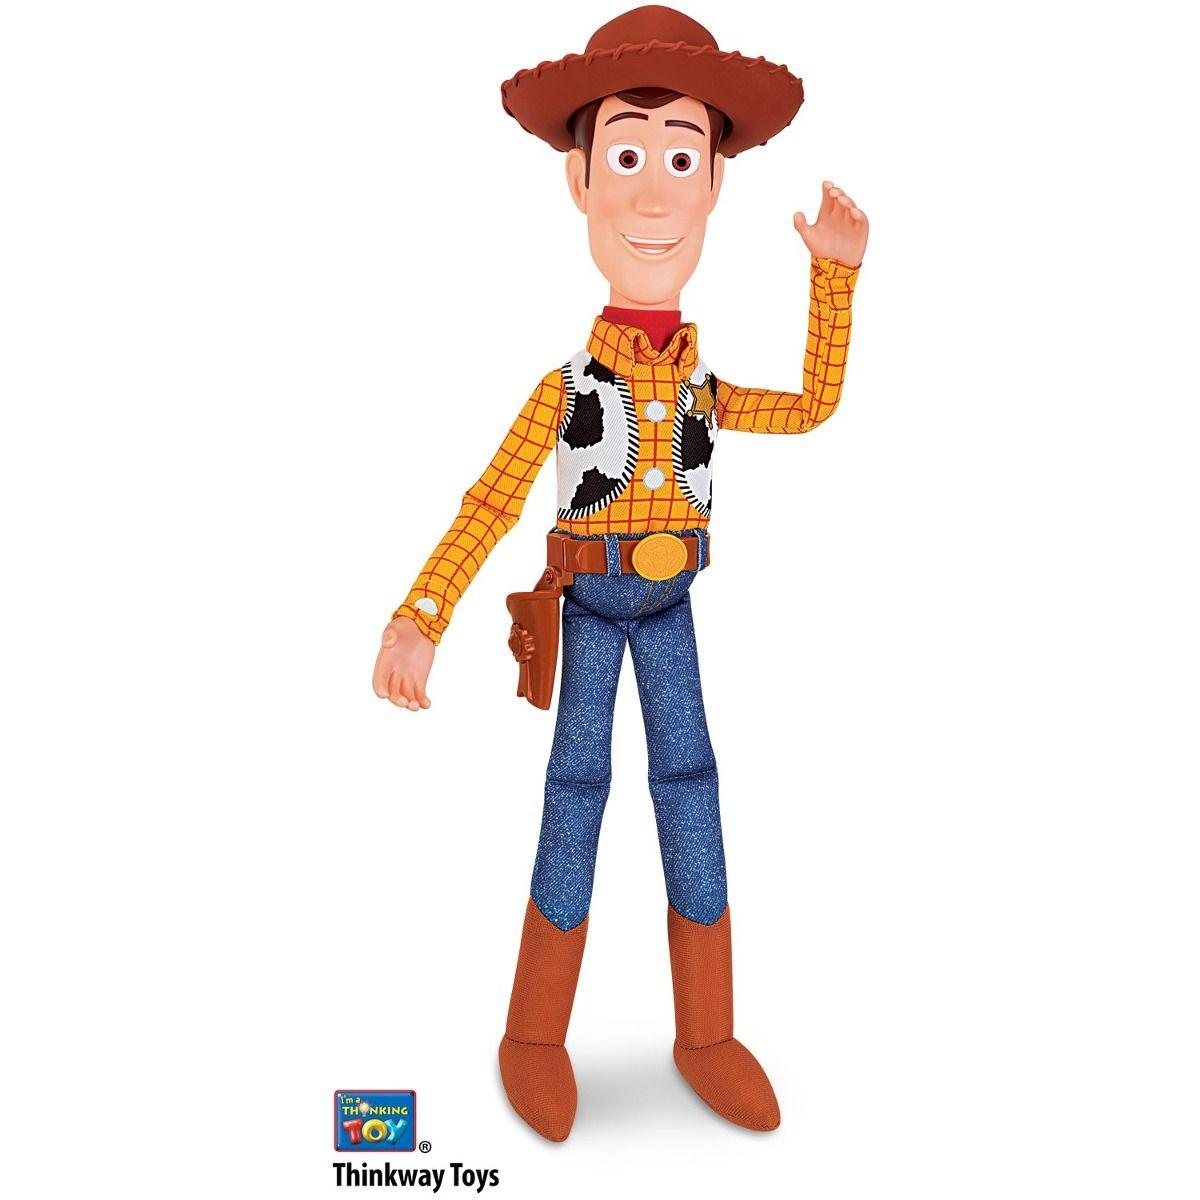 Boneco Toy Story Woody Fala 15 frases Portugues 40 cm - Toyng